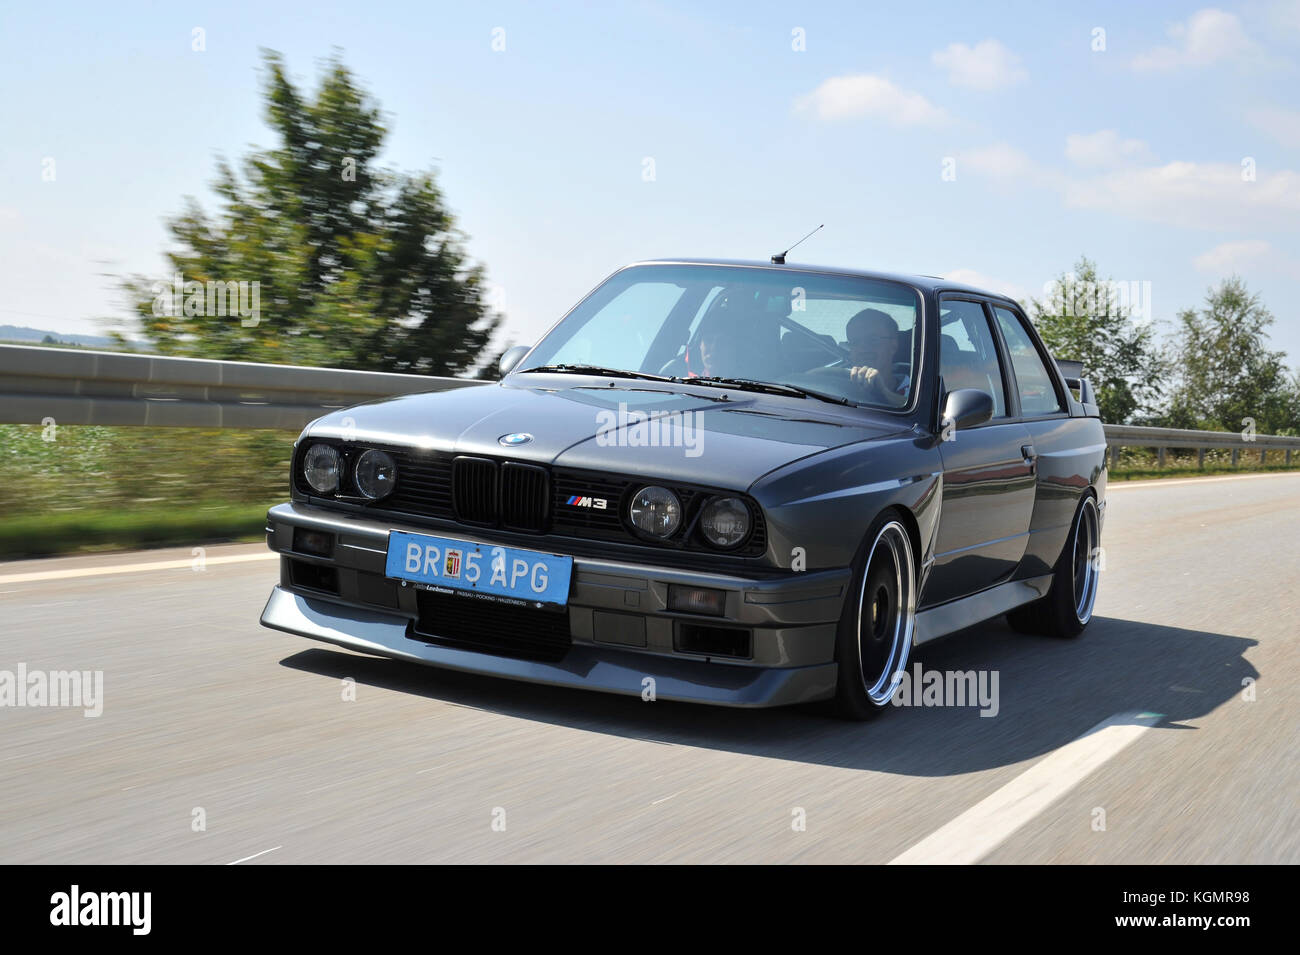 BMW E30 M3 3 Series Modified With A V10 Engine